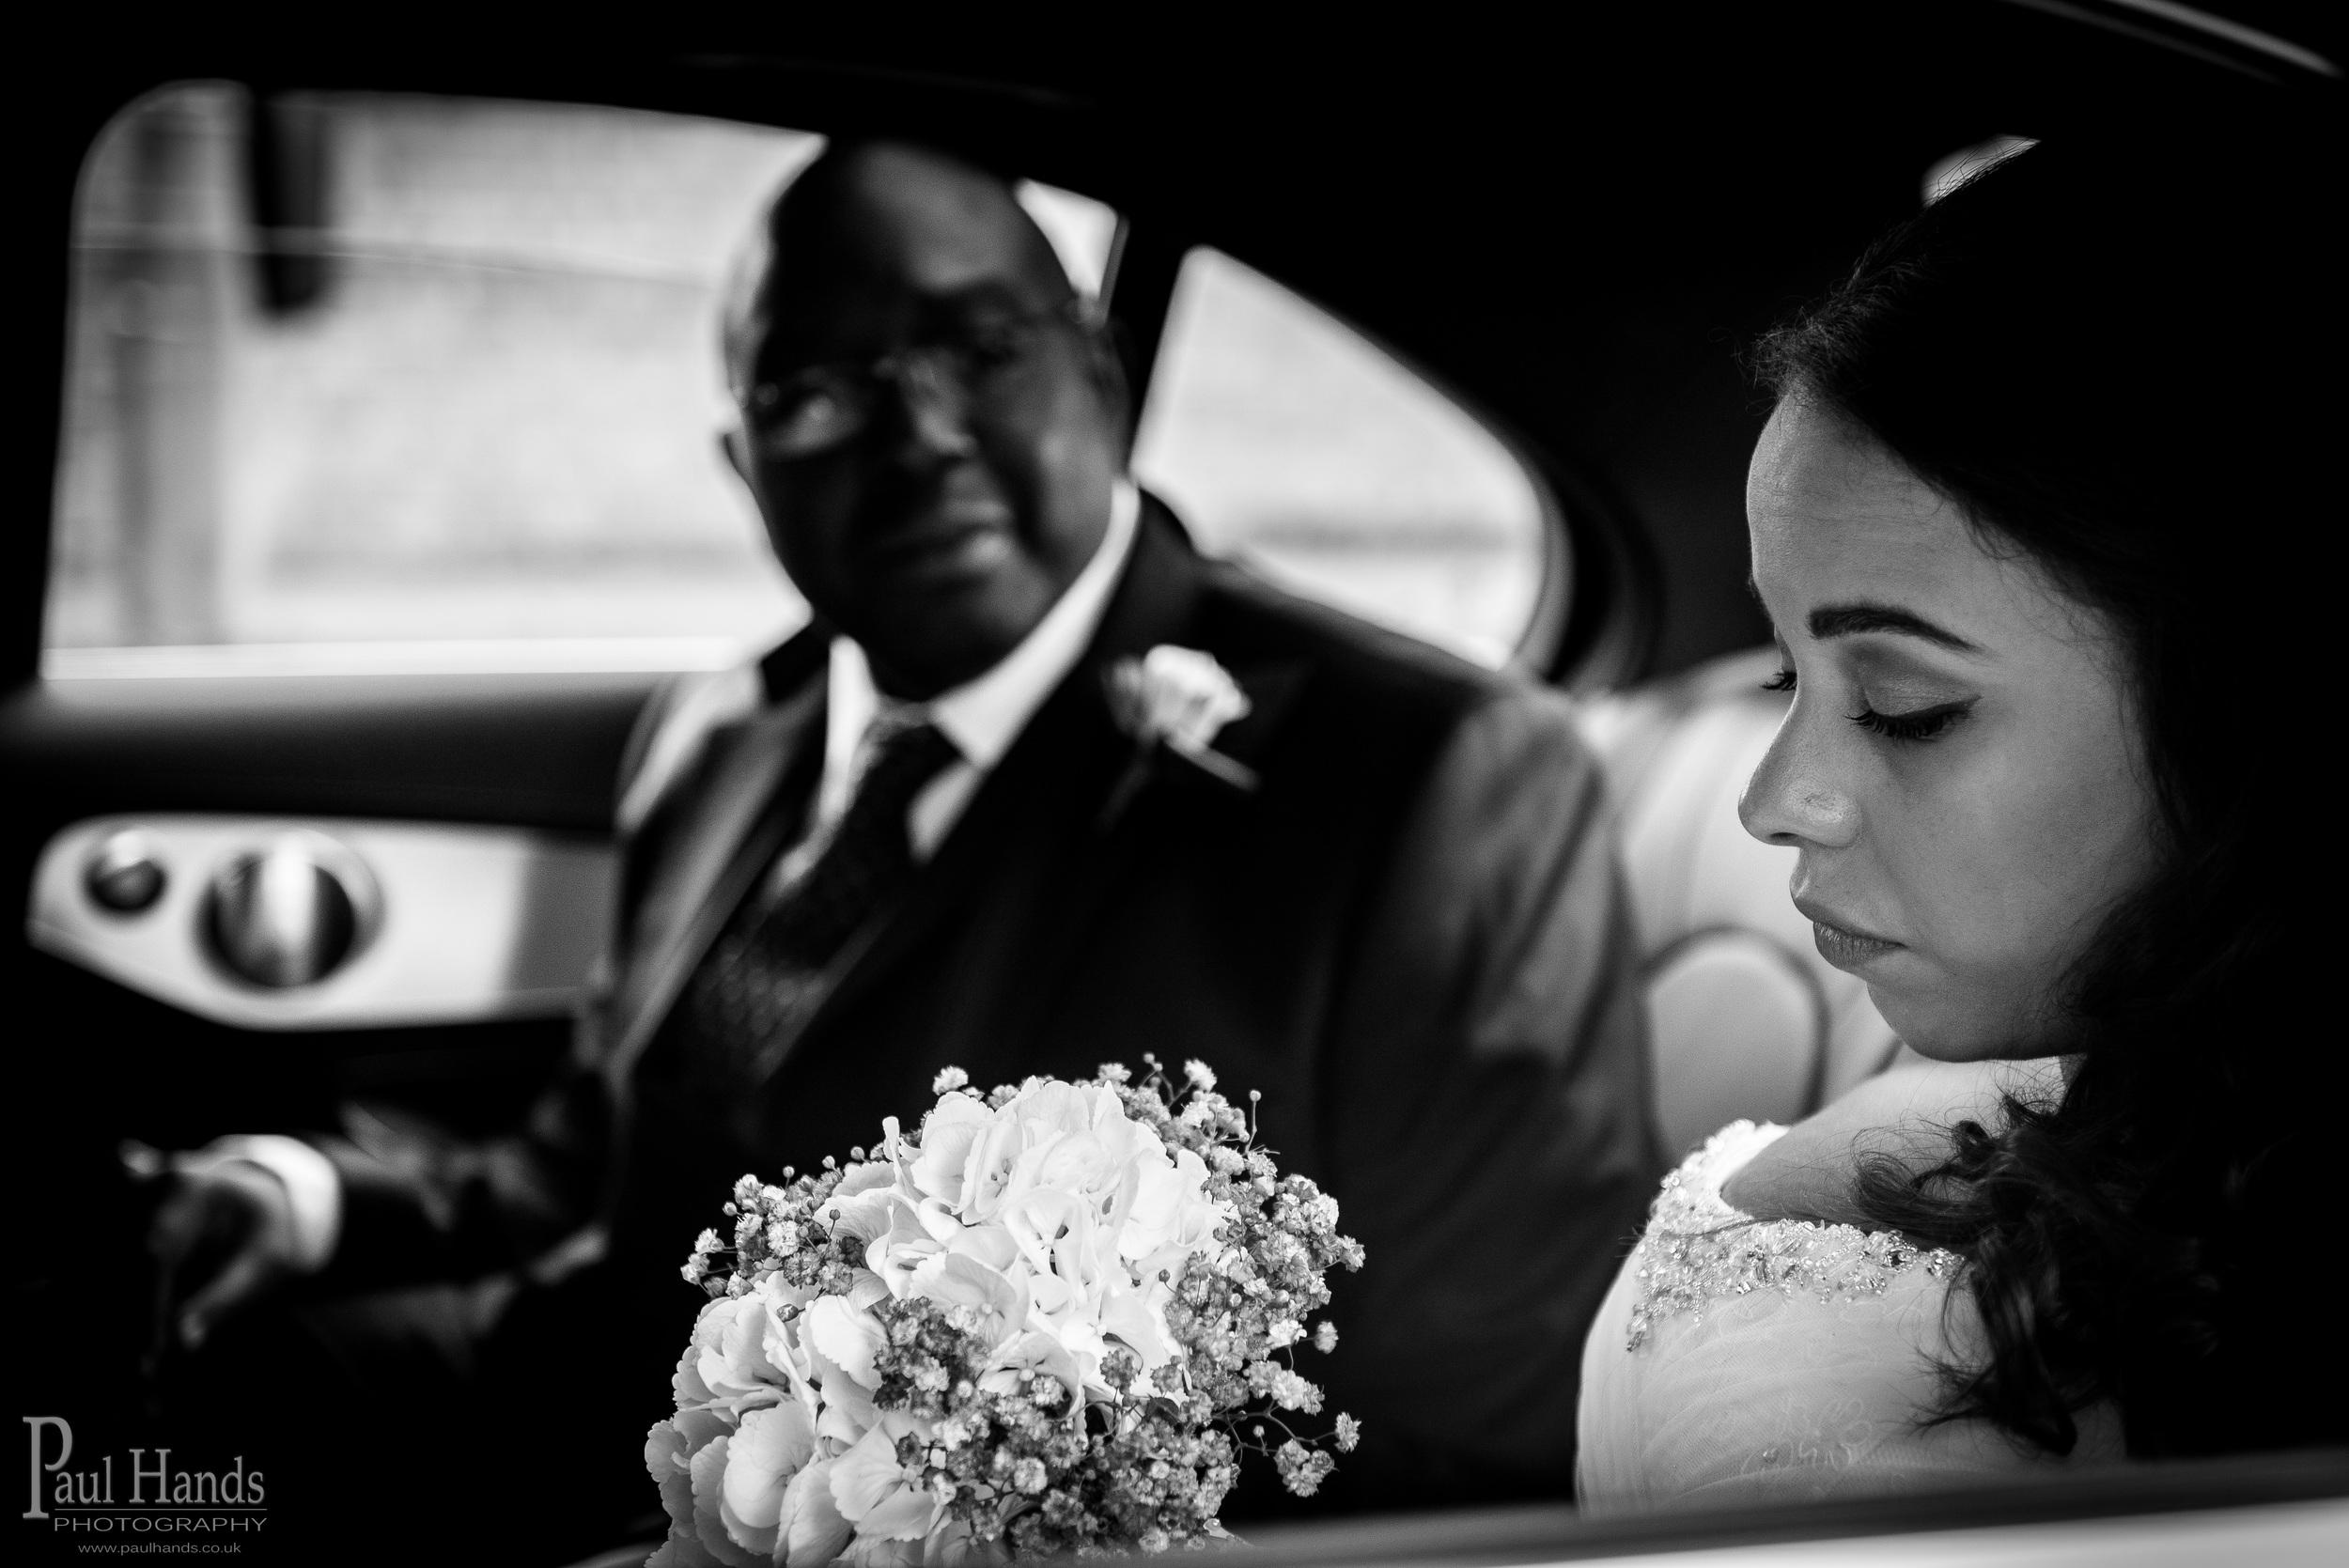 Paul Hands Photography Burbage Hinckley Leicestershire Midlands Weddings